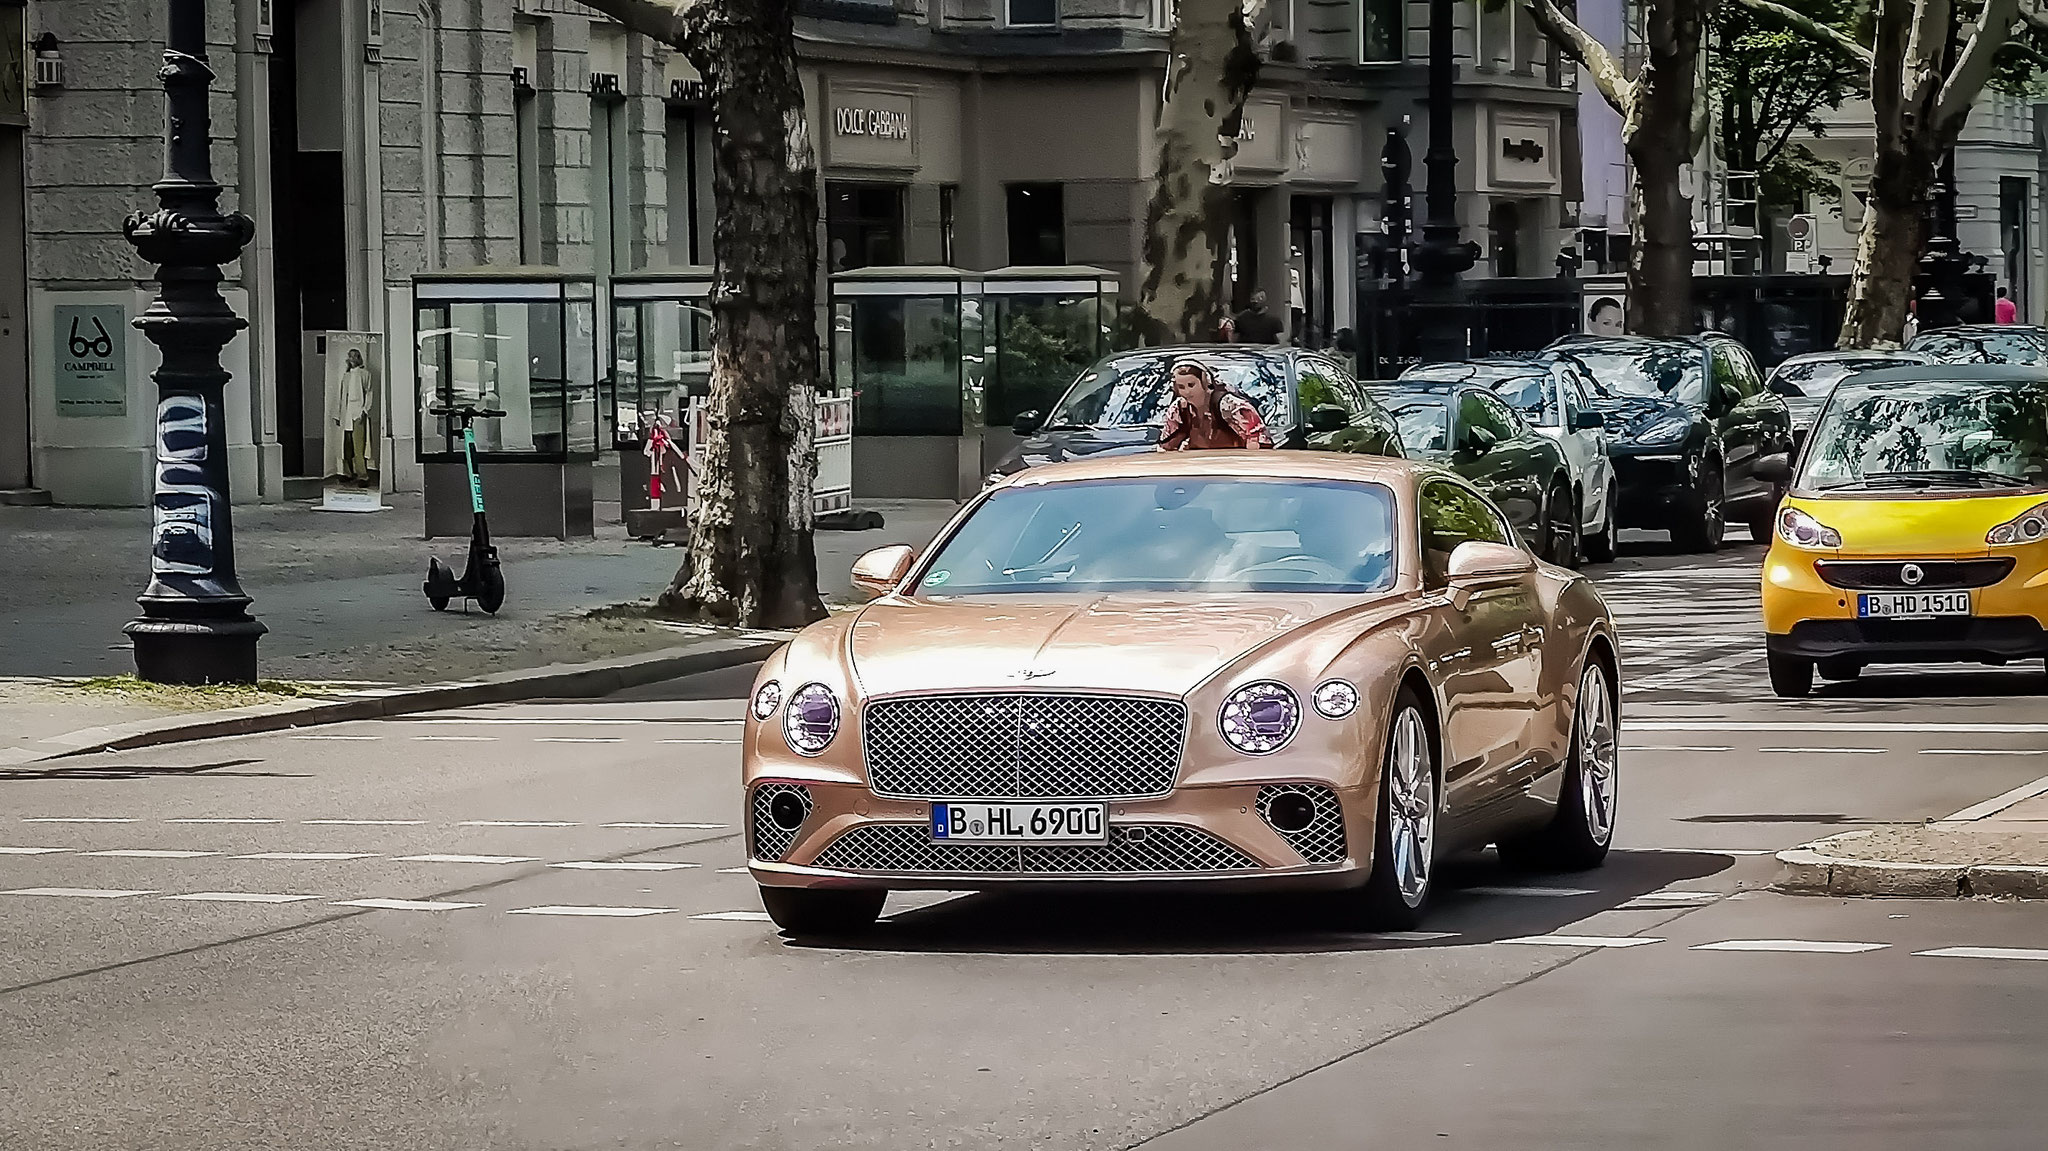 Bentley Continental GT - B-HL-6900